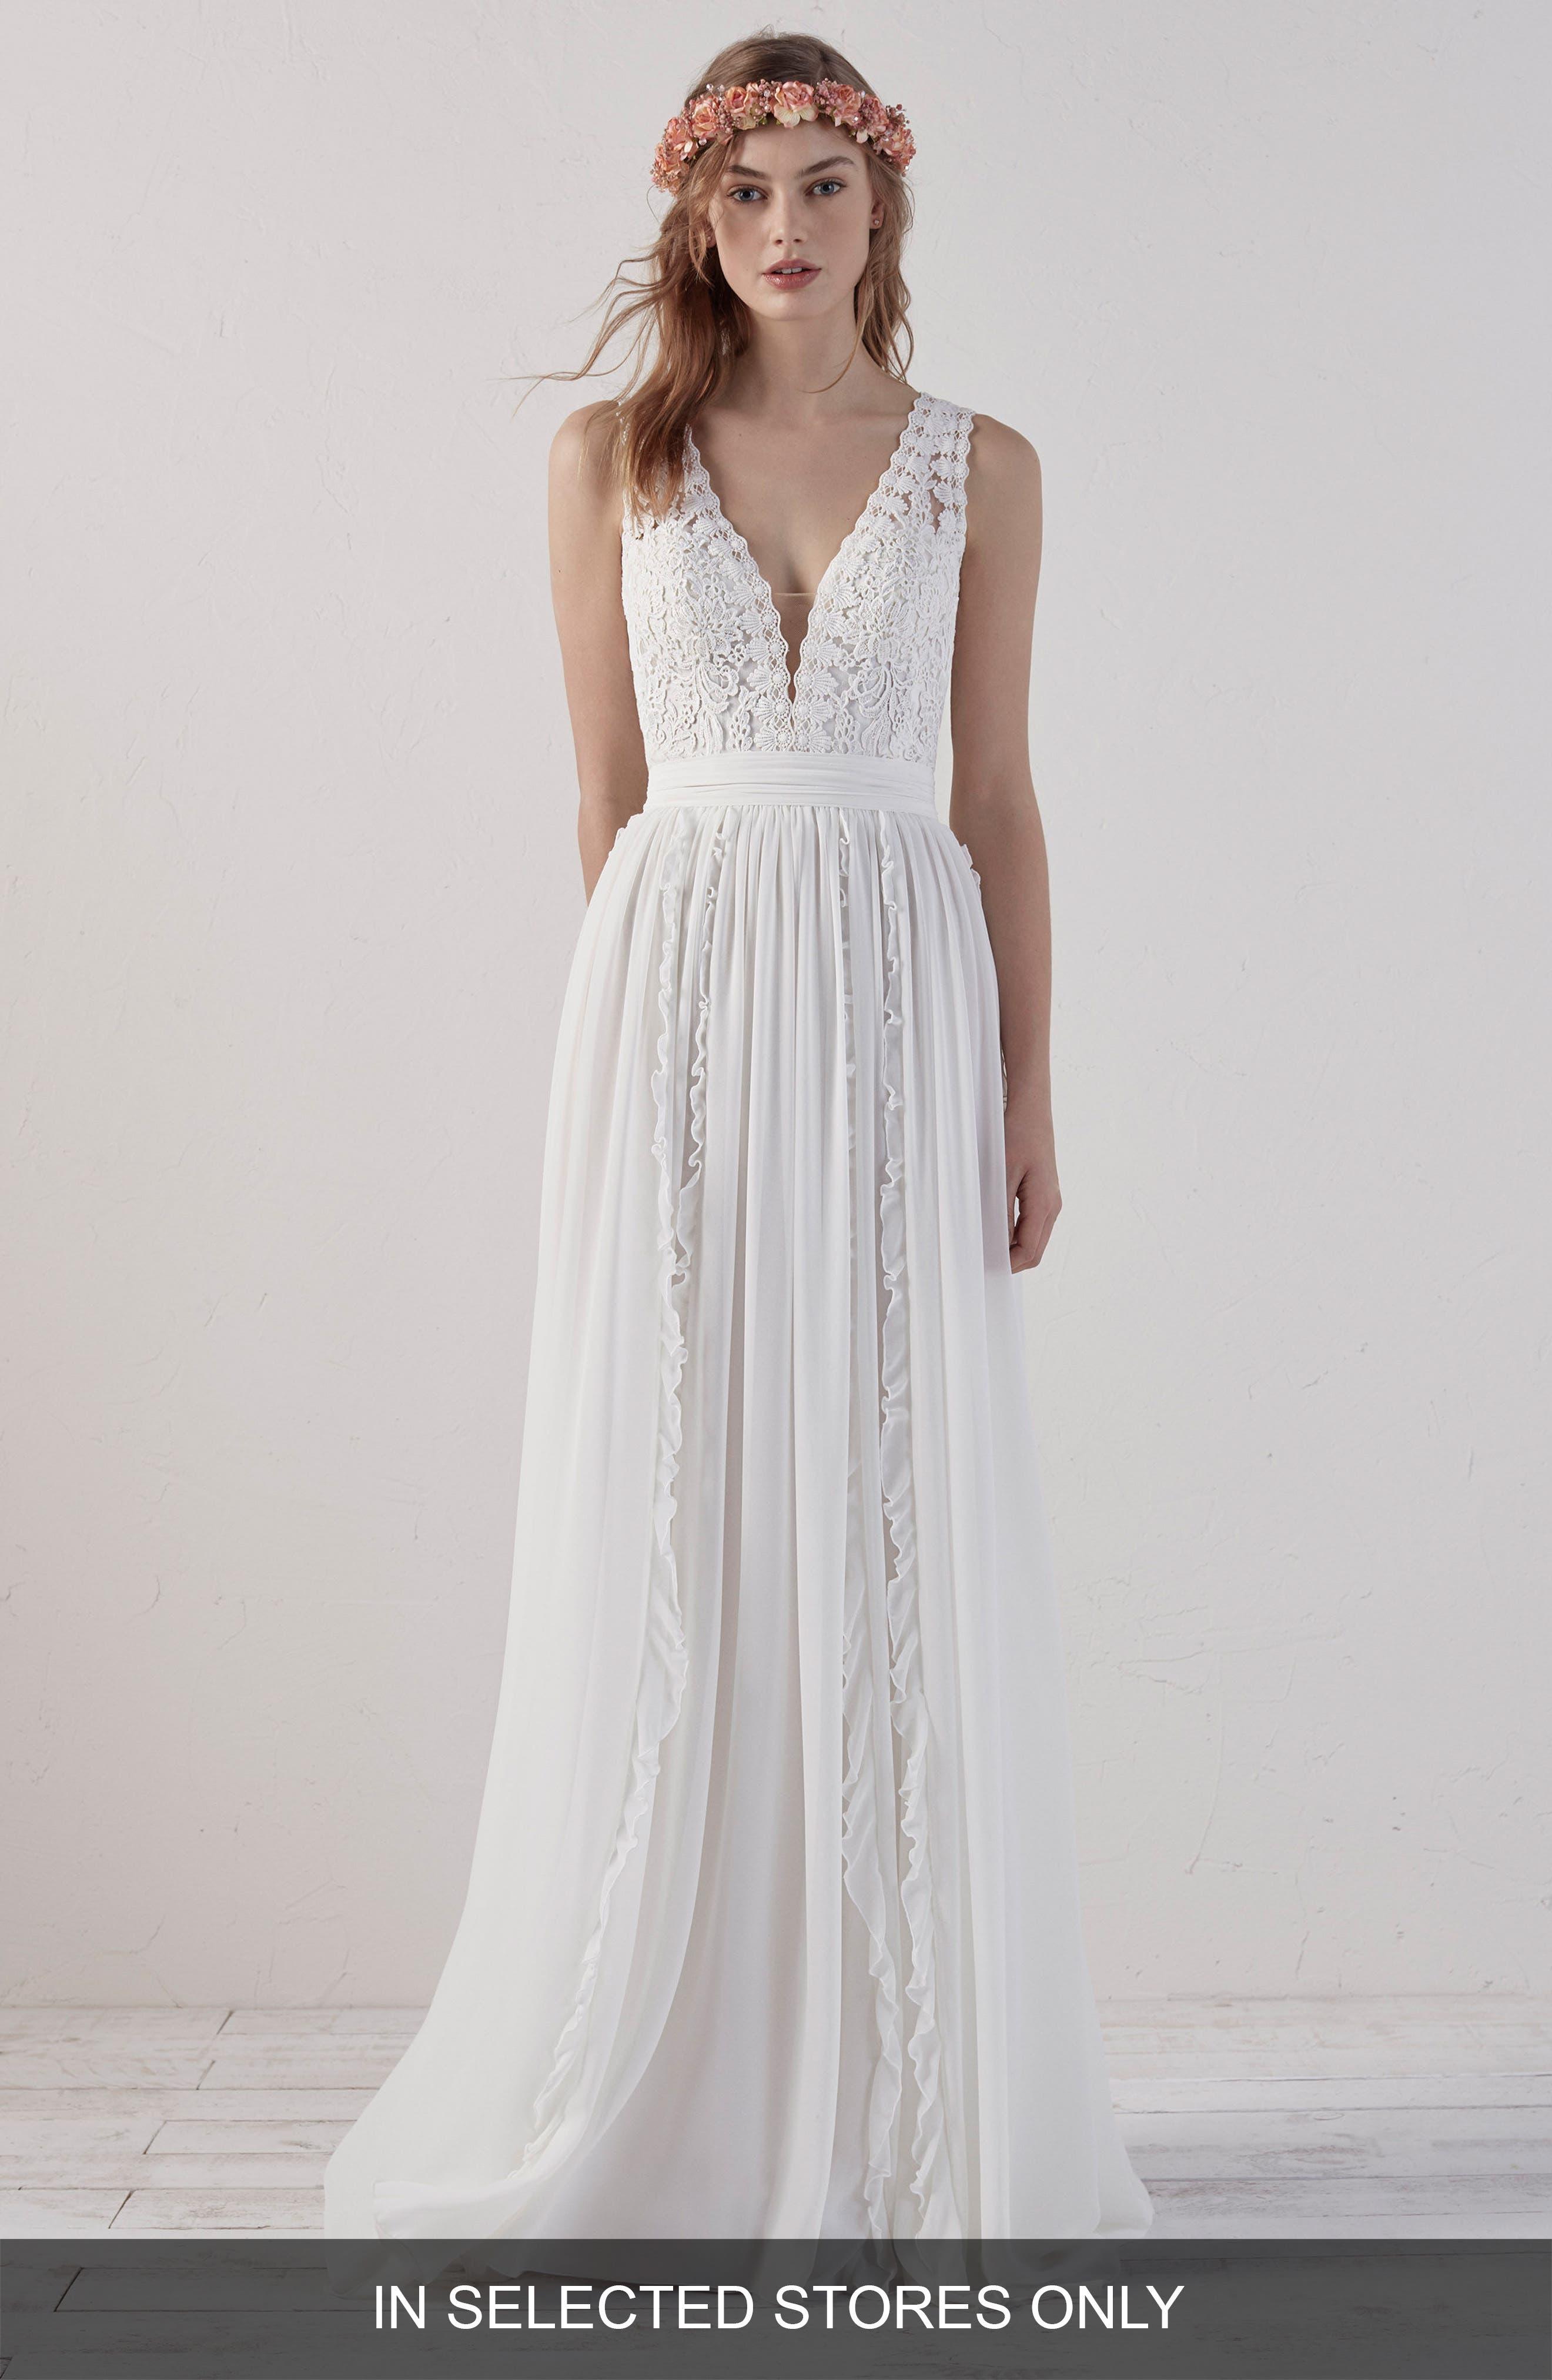 Main Image - Pronovias Elbet Boho V-Neck Lace & Chiffon Gown